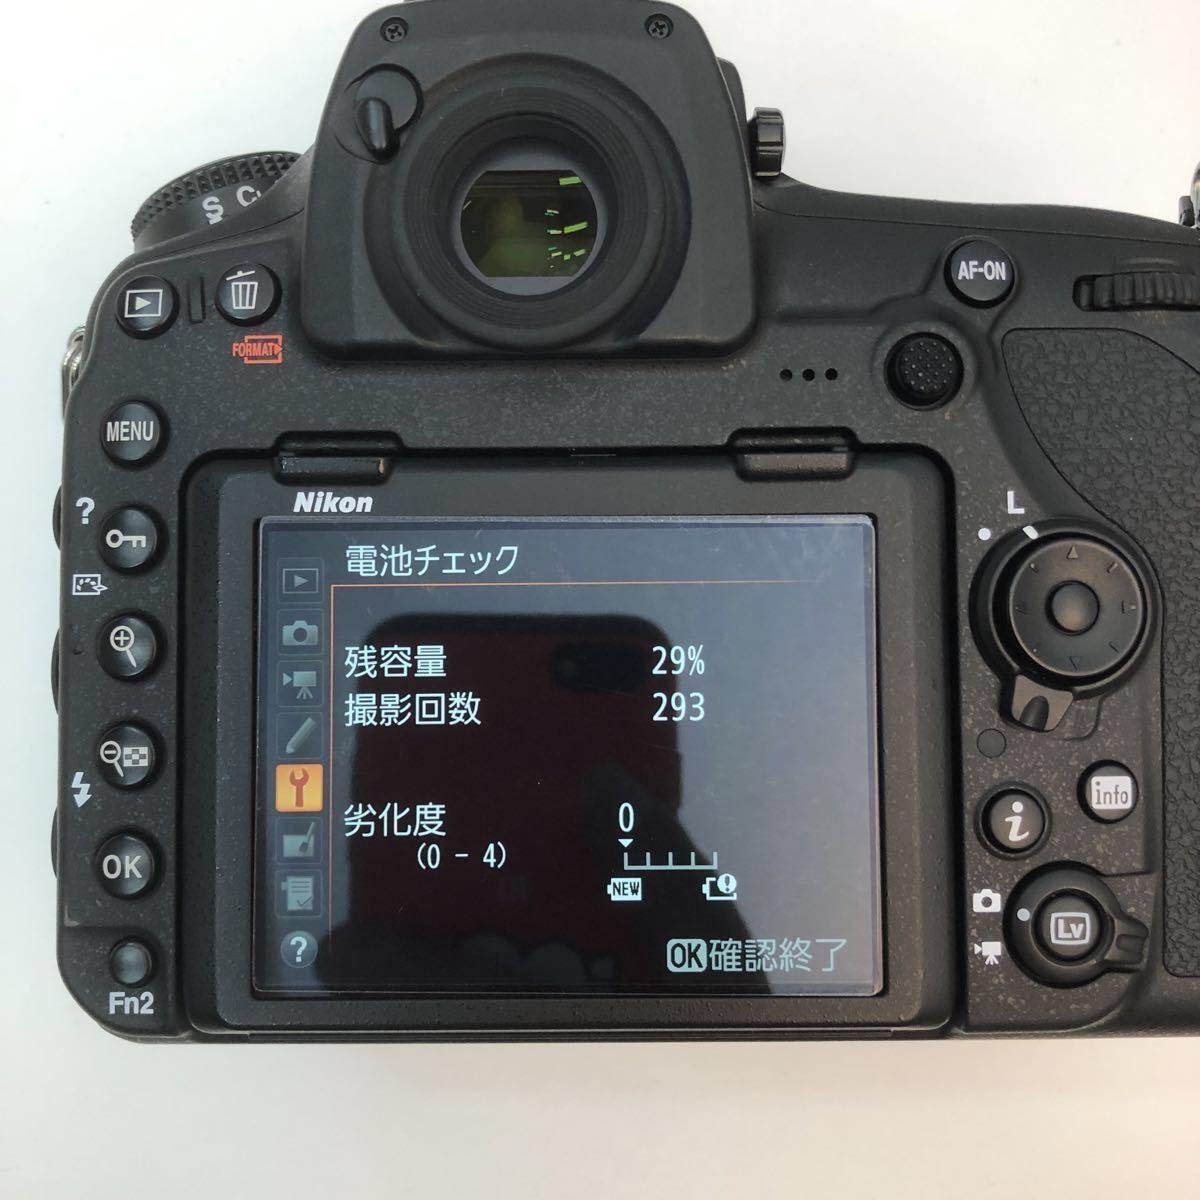 EN-EL4a 【ポイント3倍】 Li-ionリチャージャブルバッテリー Nikon